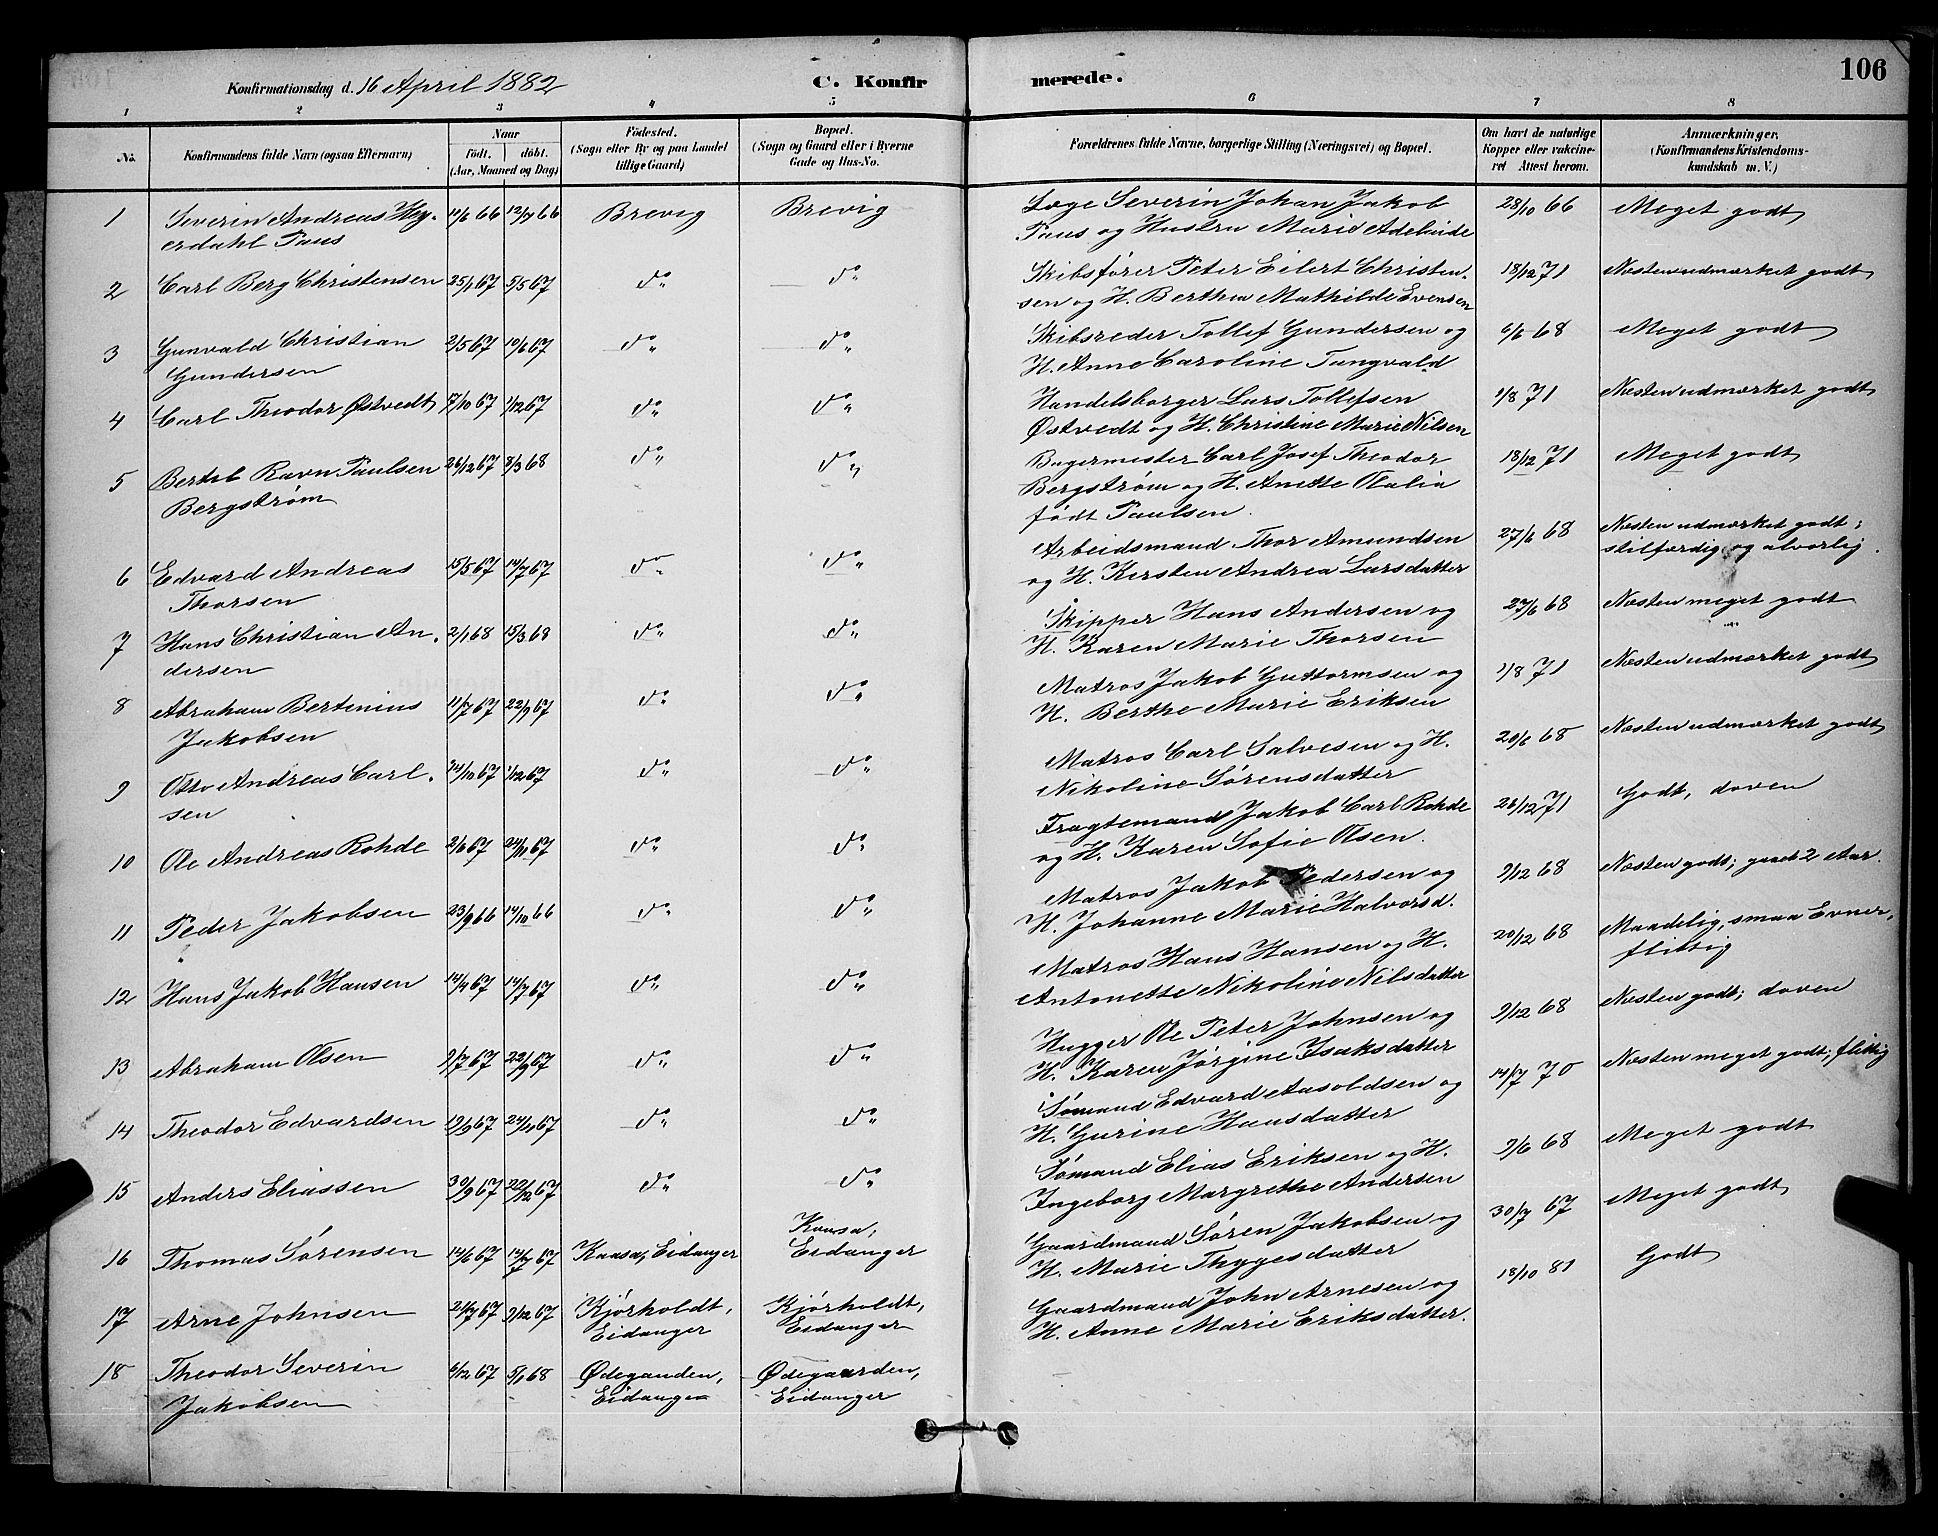 SAKO, Brevik kirkebøker, G/Ga/L0004: Klokkerbok nr. 4, 1882-1900, s. 106